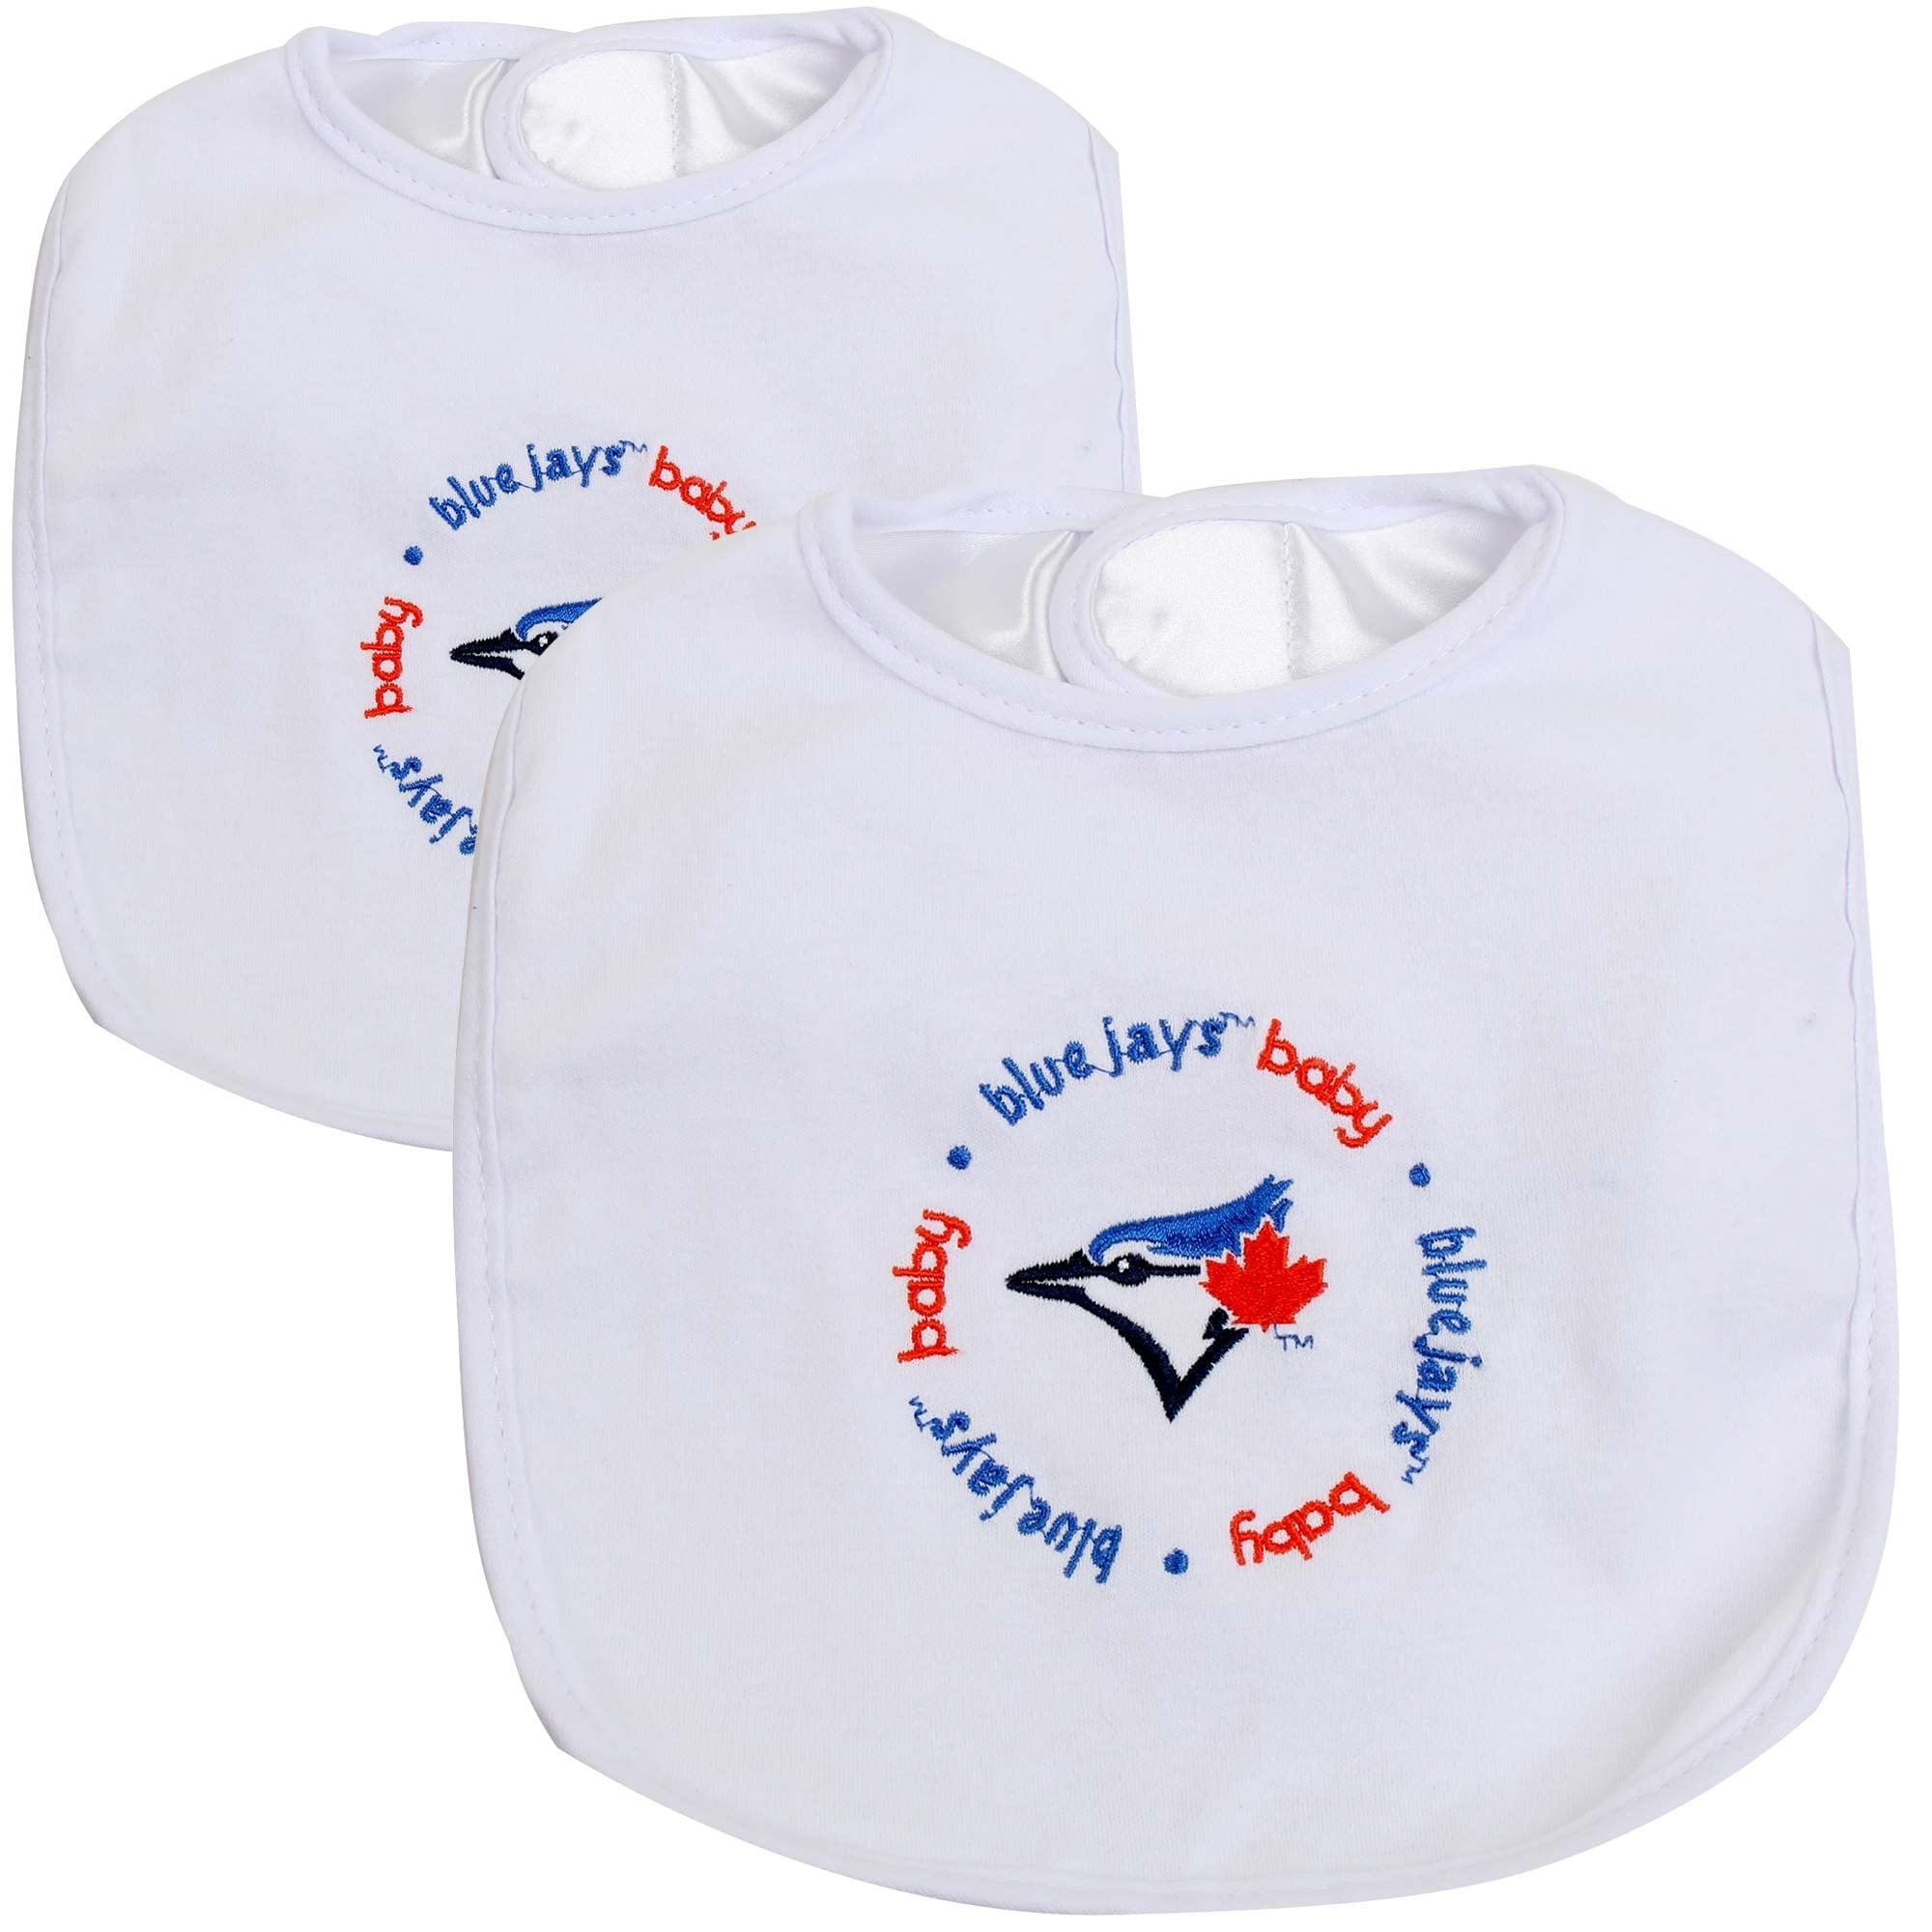 Toronto Blue Jays 2-Pack Baby Bibs - White